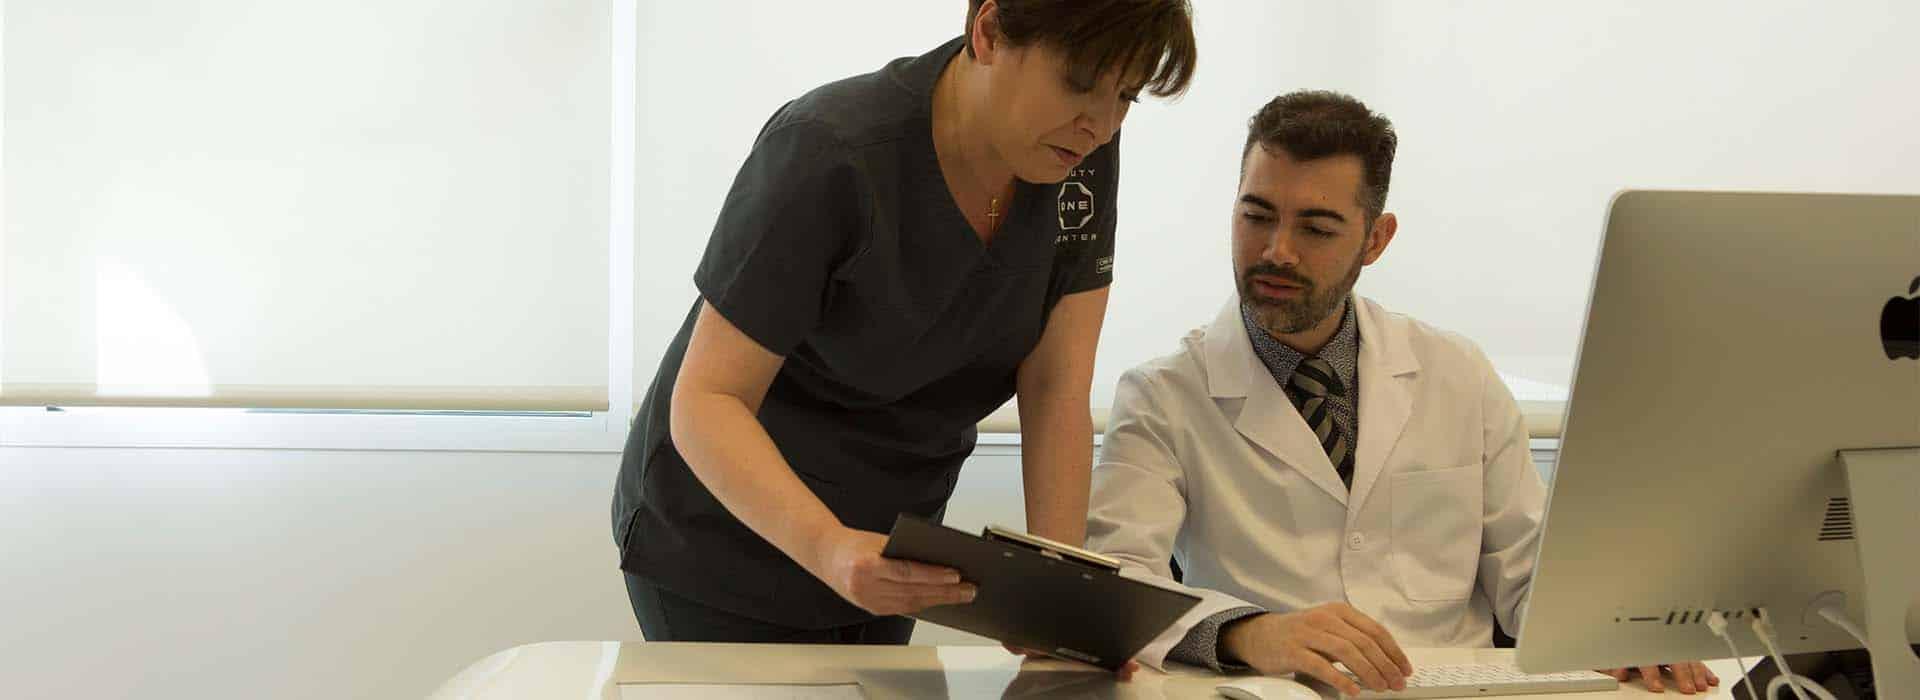 Clínica de Cirugía Estética en España, Madrid